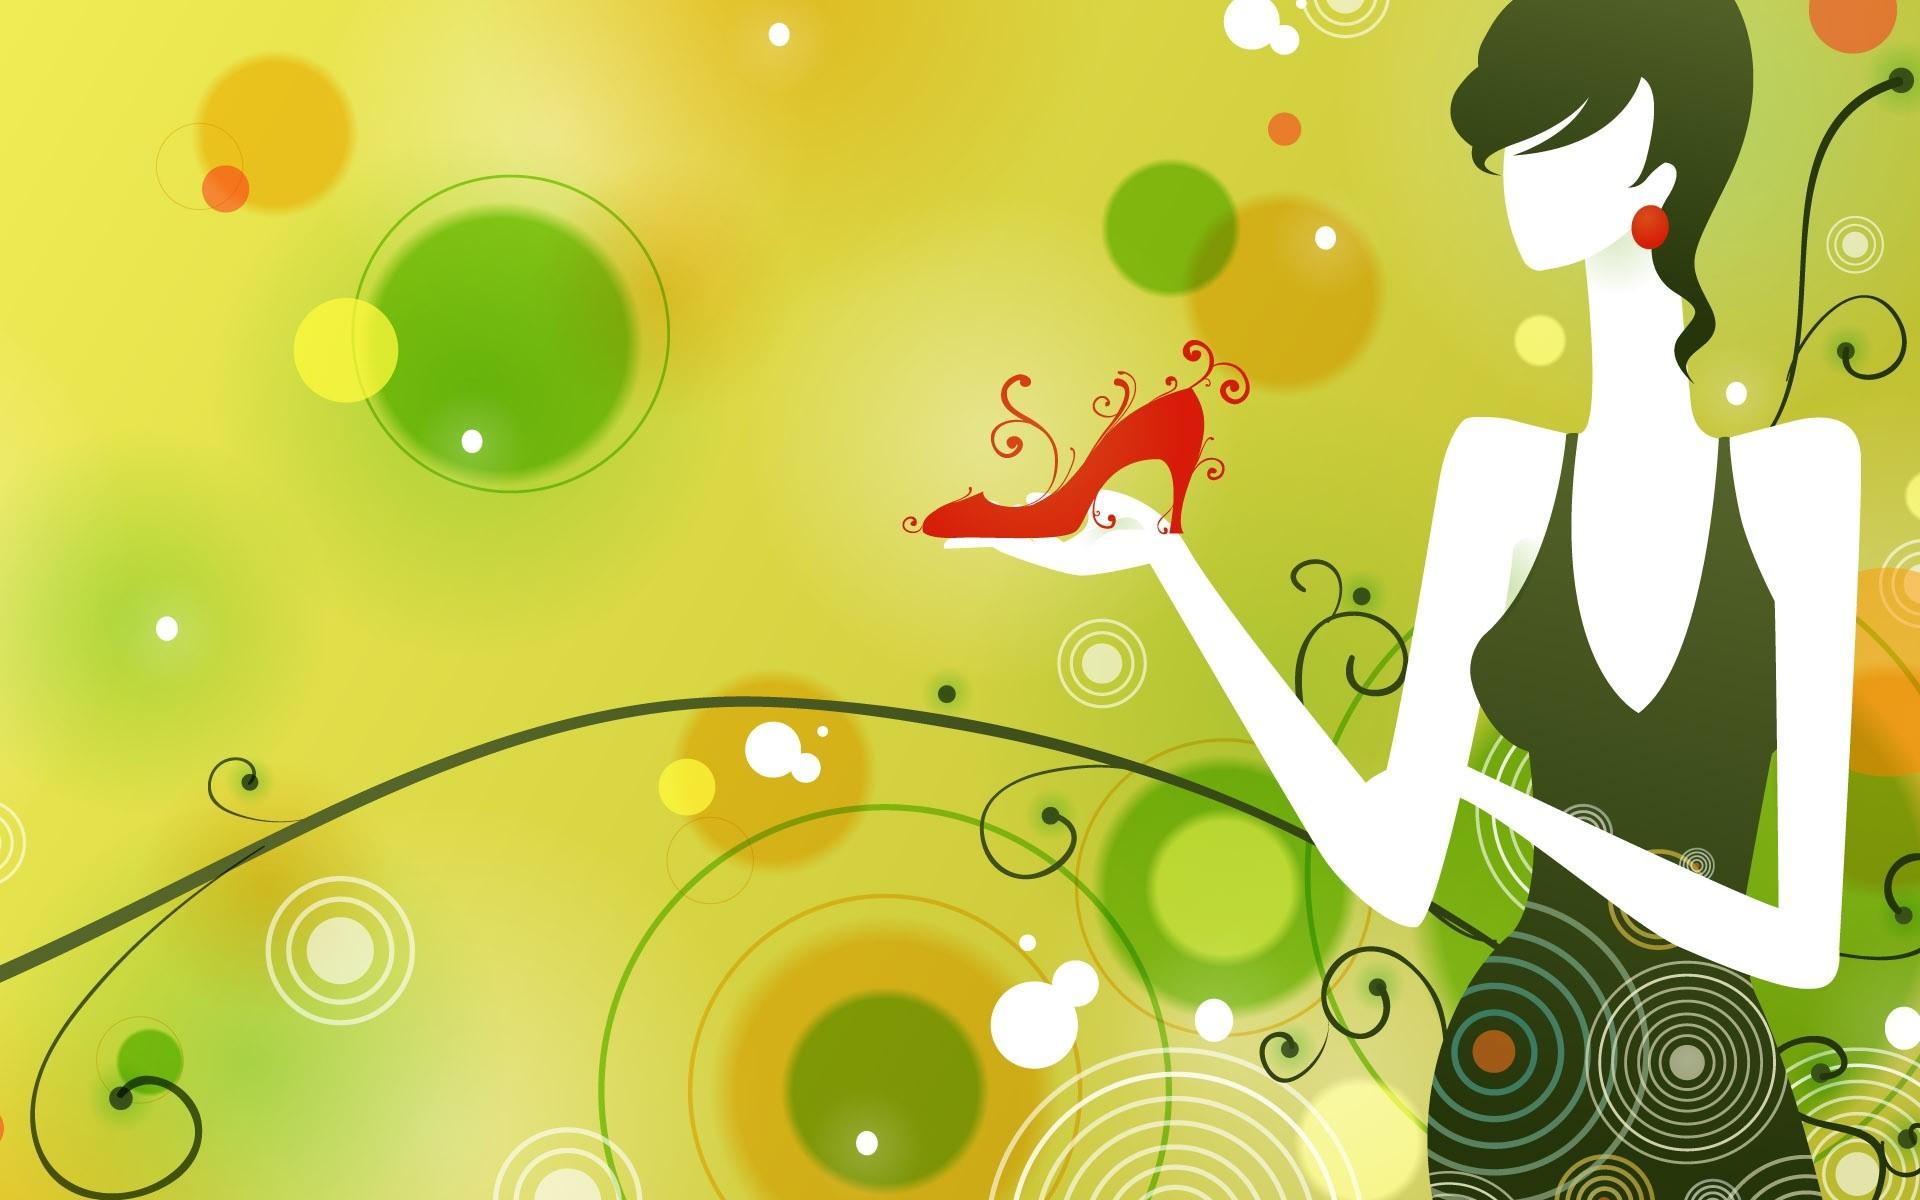 Green Fashion Girl Ppt Theme · Green fashion girl ppt theme free powerpoint  background